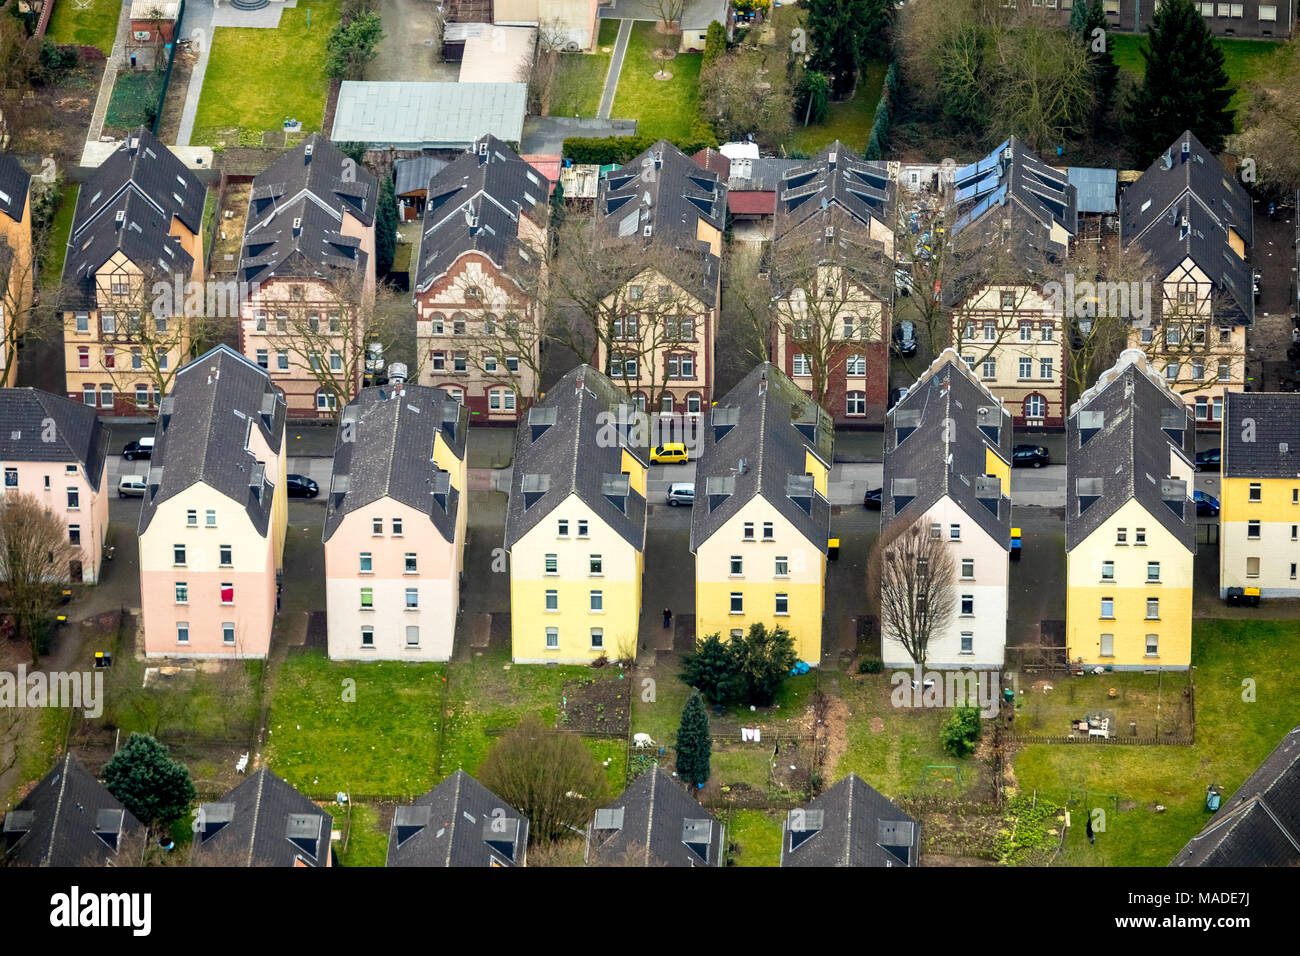 Residential row houses on the street in Breisach Obermeiderich, social housing, ThyssenKrupp Residential Real Estate GmbH, Duisburg-Nord in Duisburg i - Stock Image